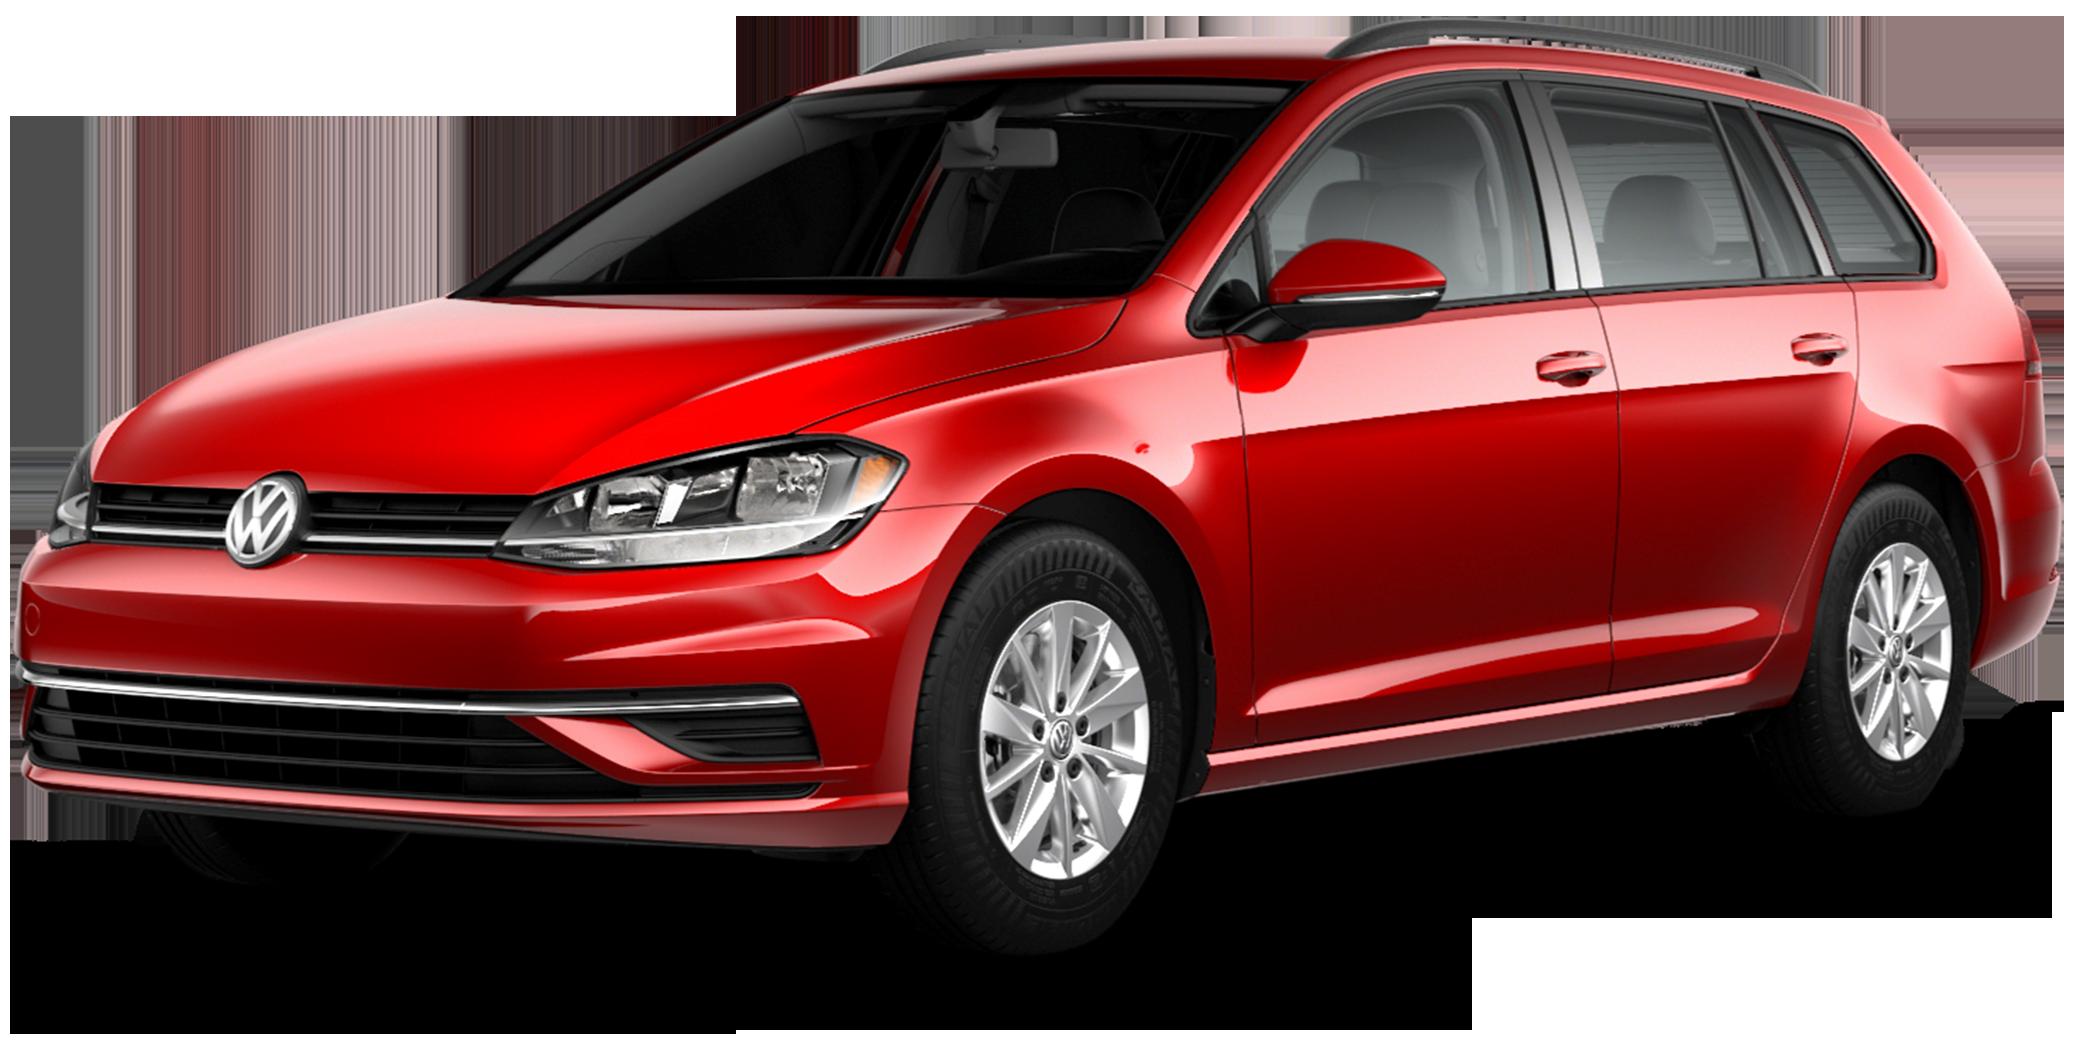 2019 Volkswagen Golf SportWagen Incentives, Specials